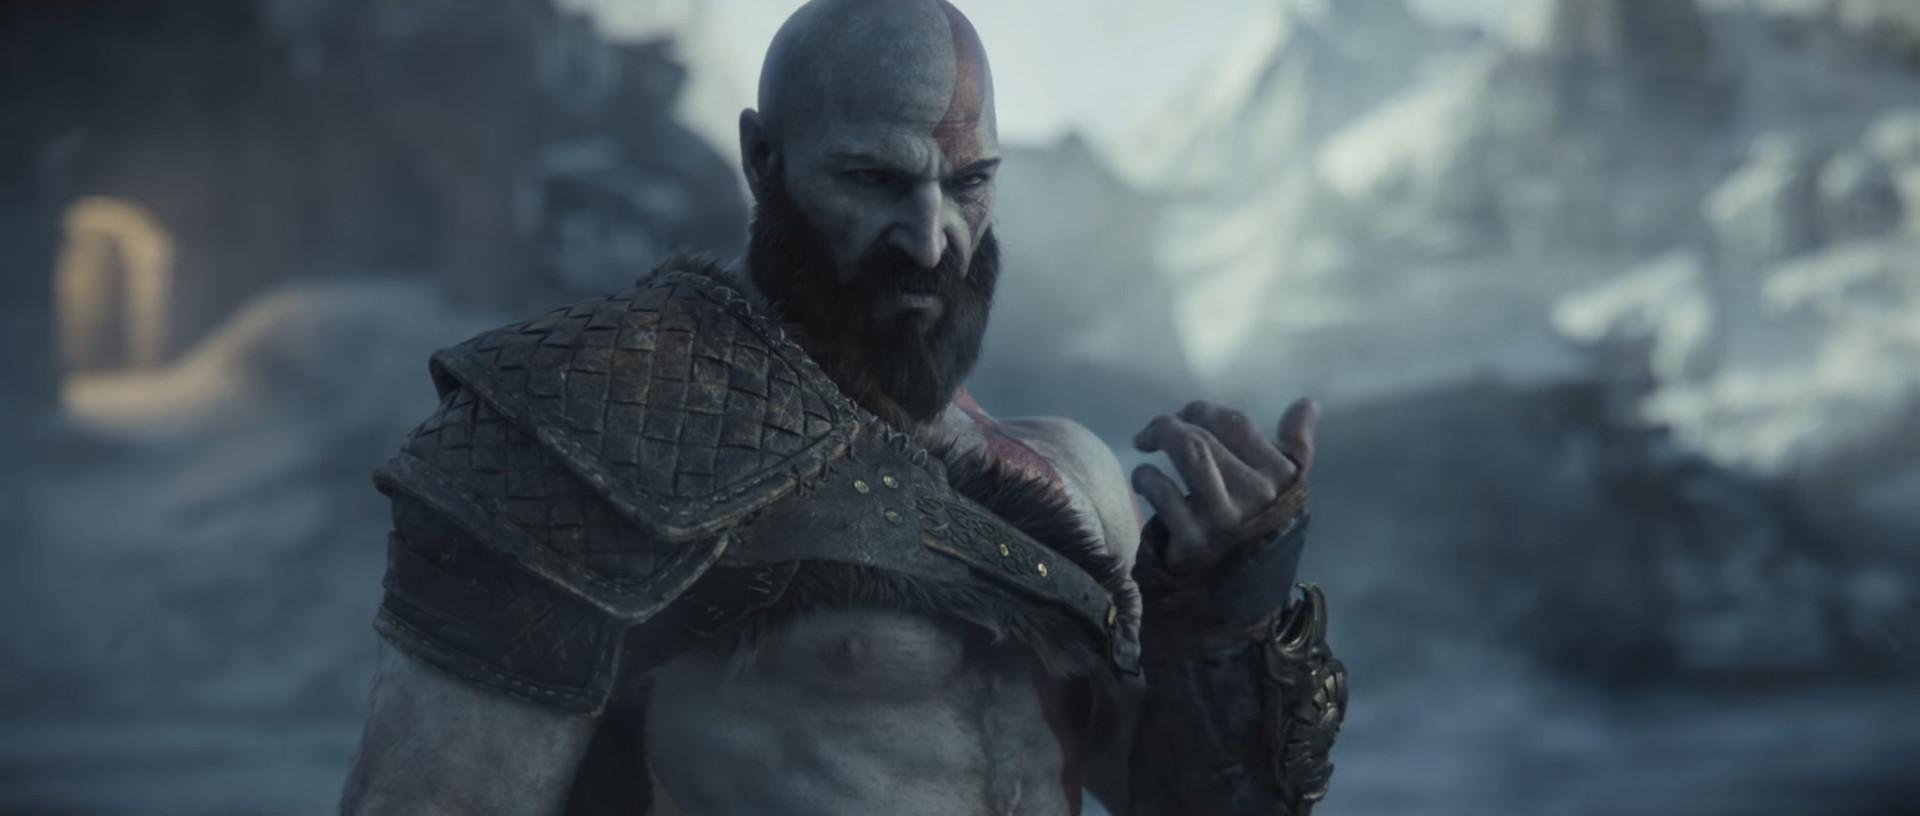 duc  phil  nguyen - god of war  ps4  tv commercial